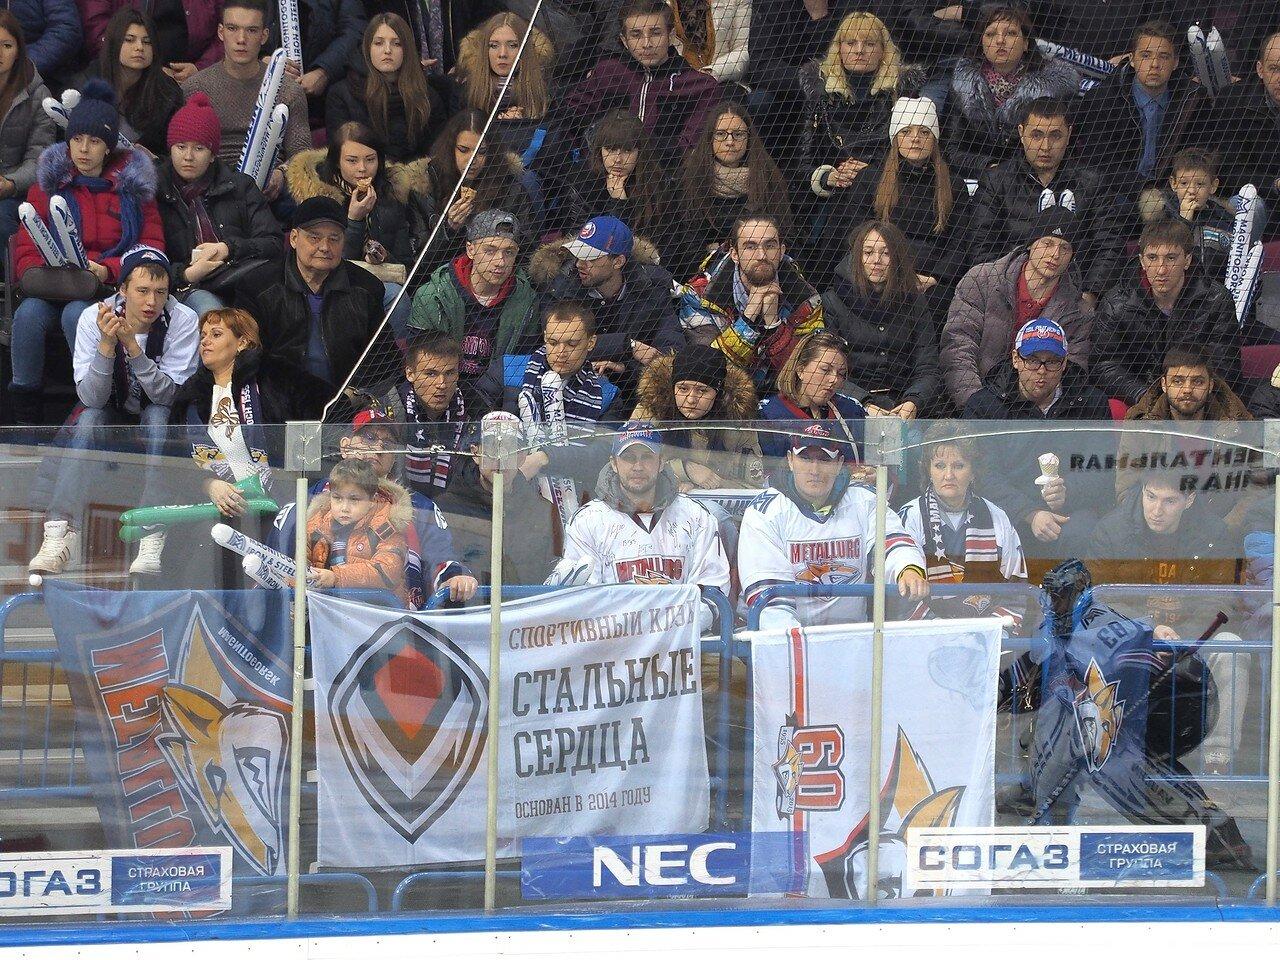 63Плей-офф 2016 Восток 1/2 Металлург - Сибирь 16.03.2016